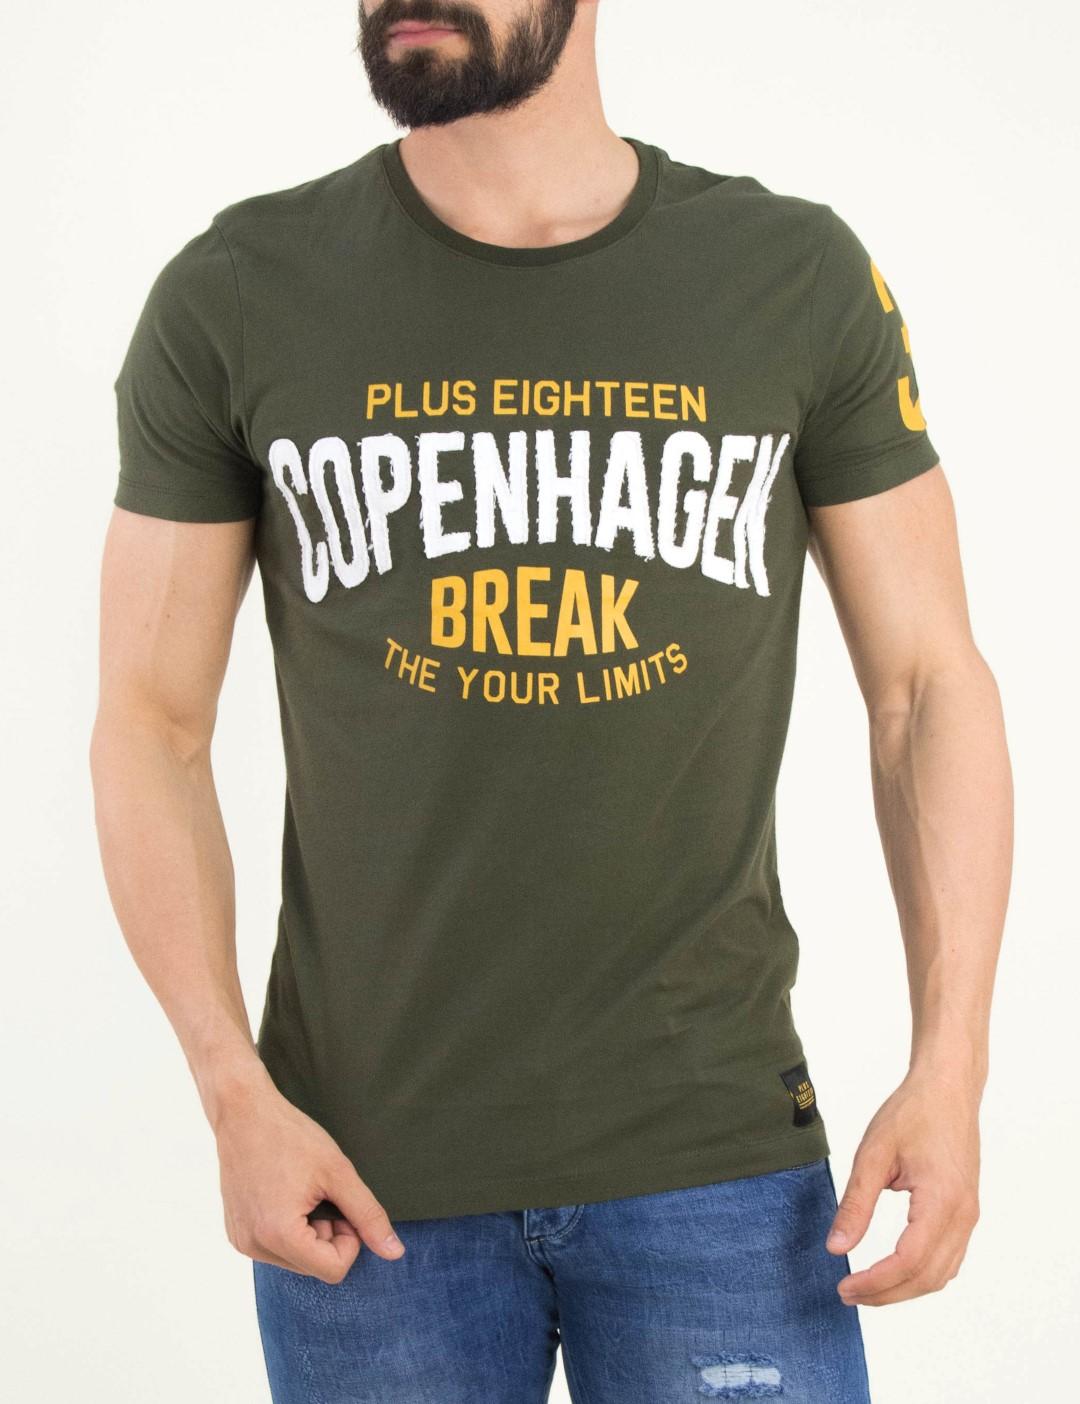 68756da893f8 Ανδρικό χακί μονόχρωμο Tshirt τύπωμα Plus Eighteen 3852L